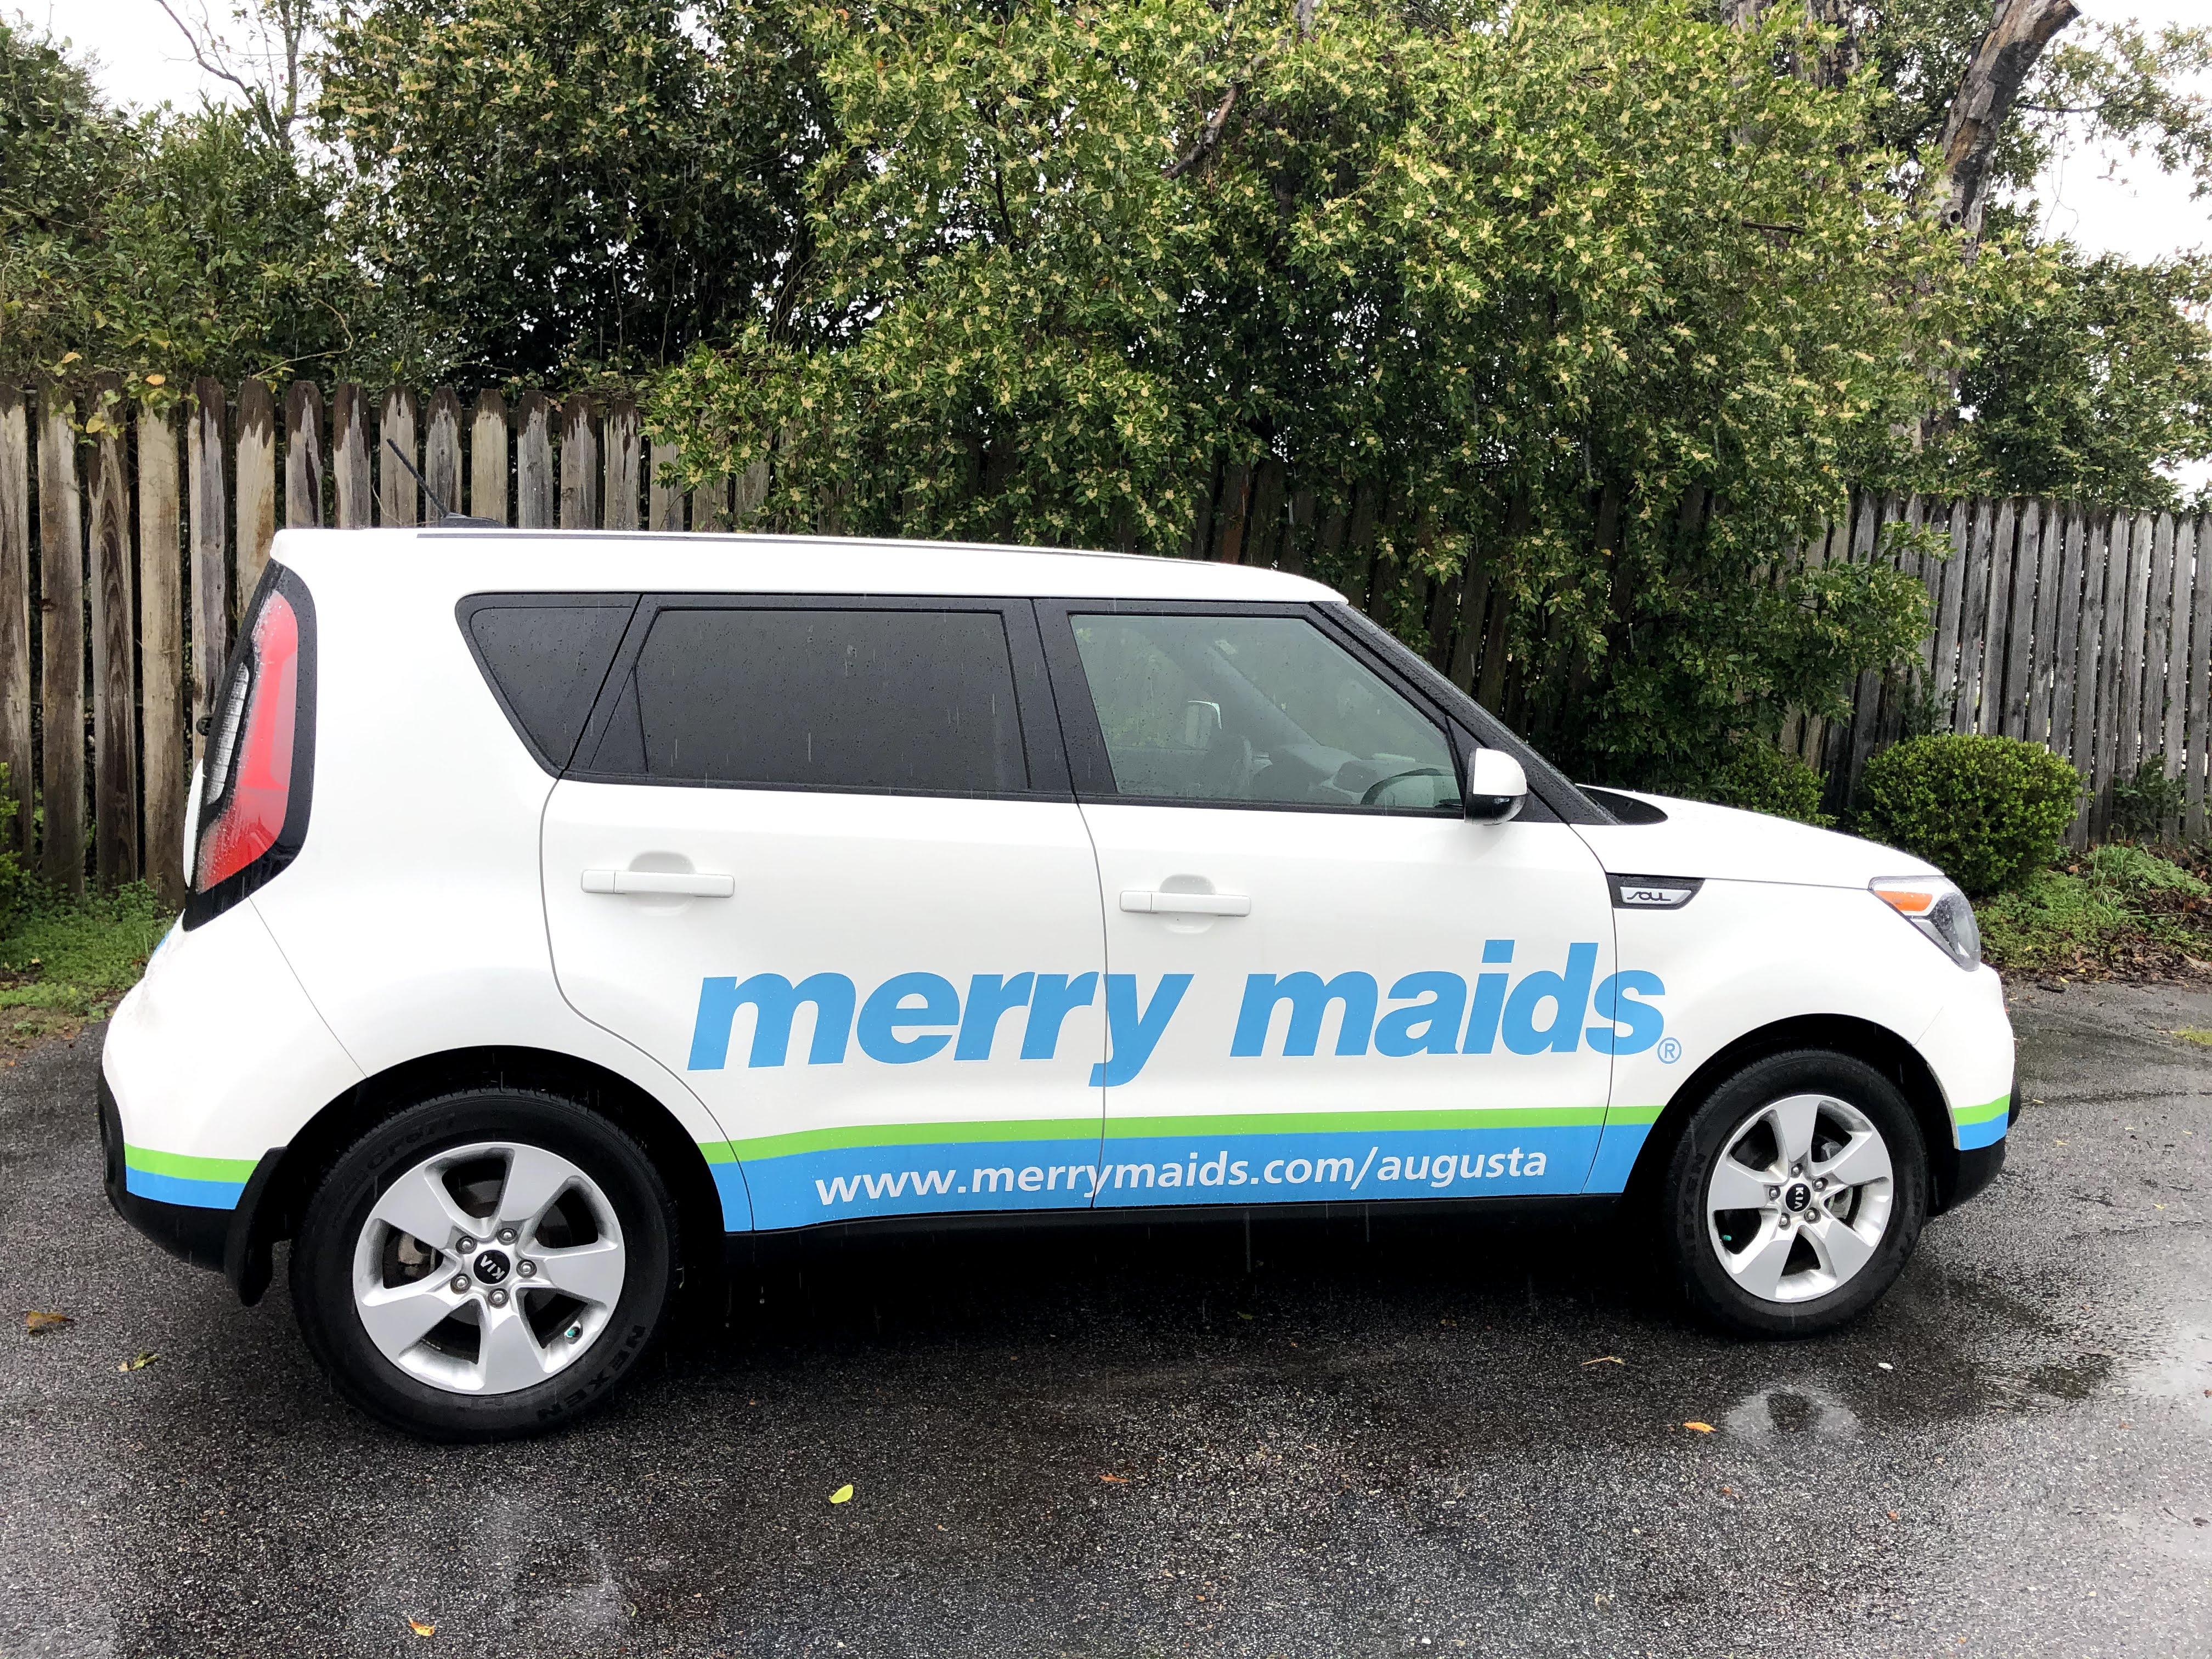 Merry Maids Car